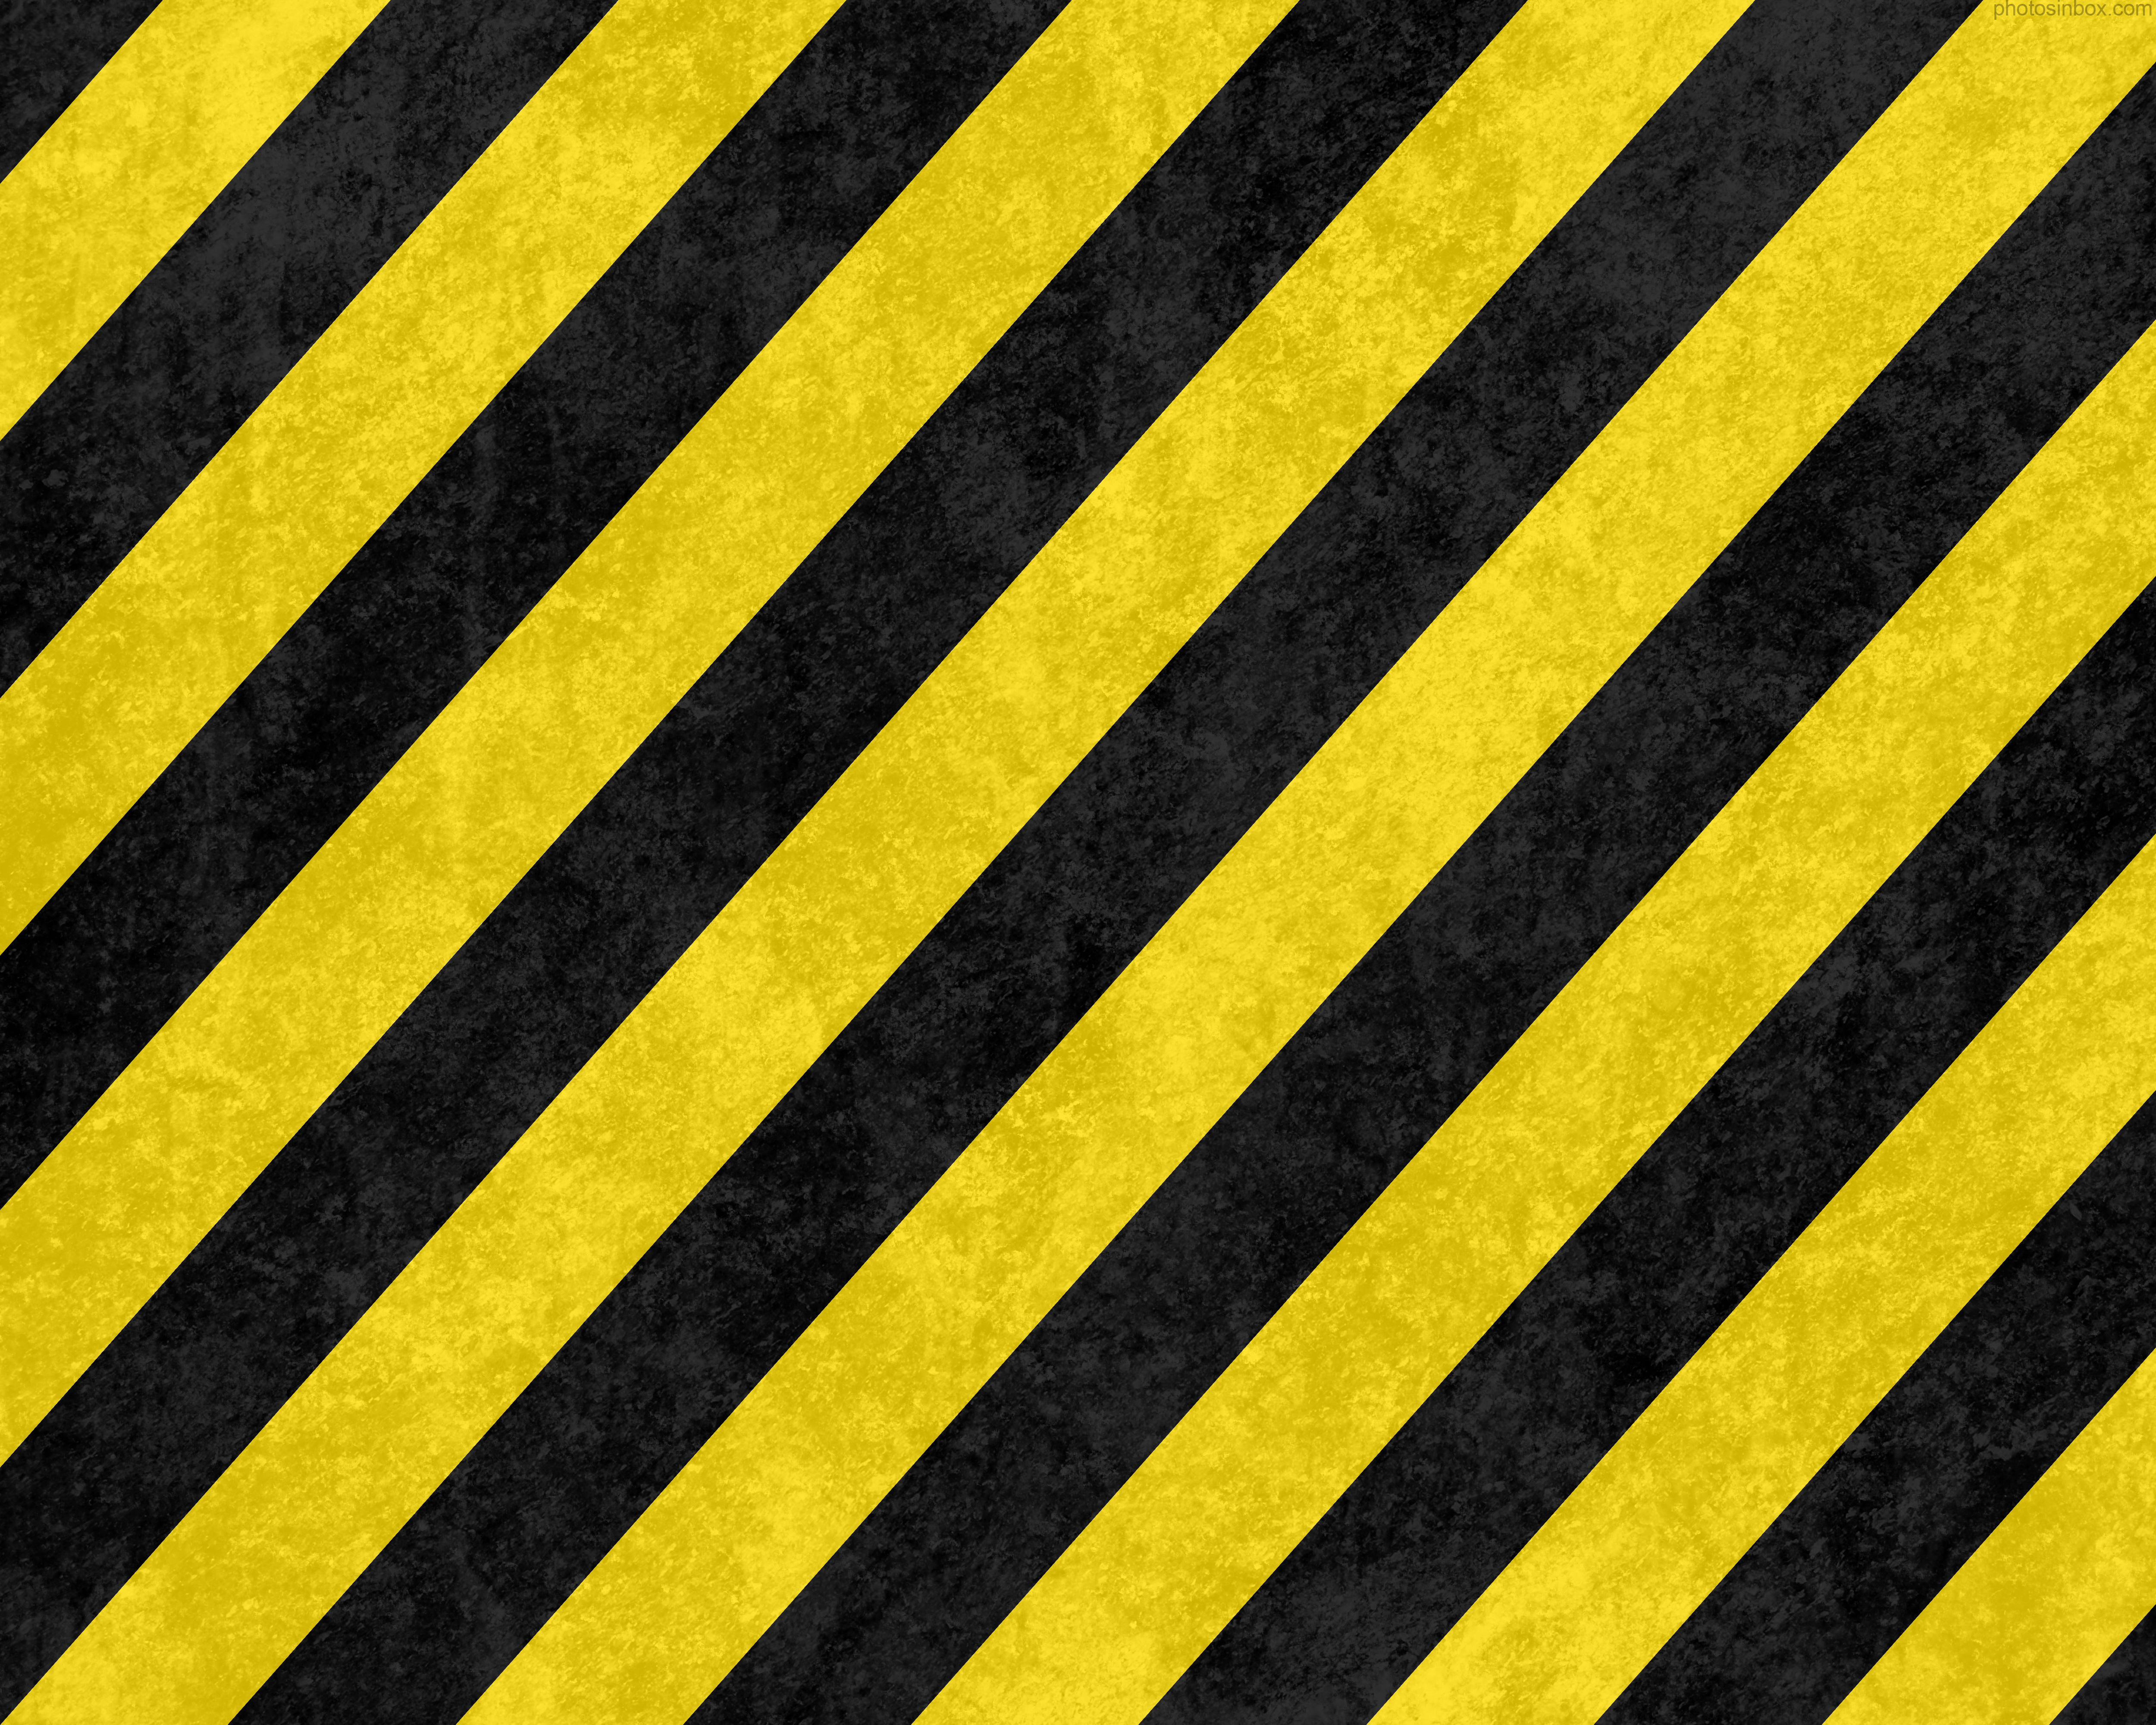 Yellow Stripe Wallpaper: Black And Yellow Wallpaper